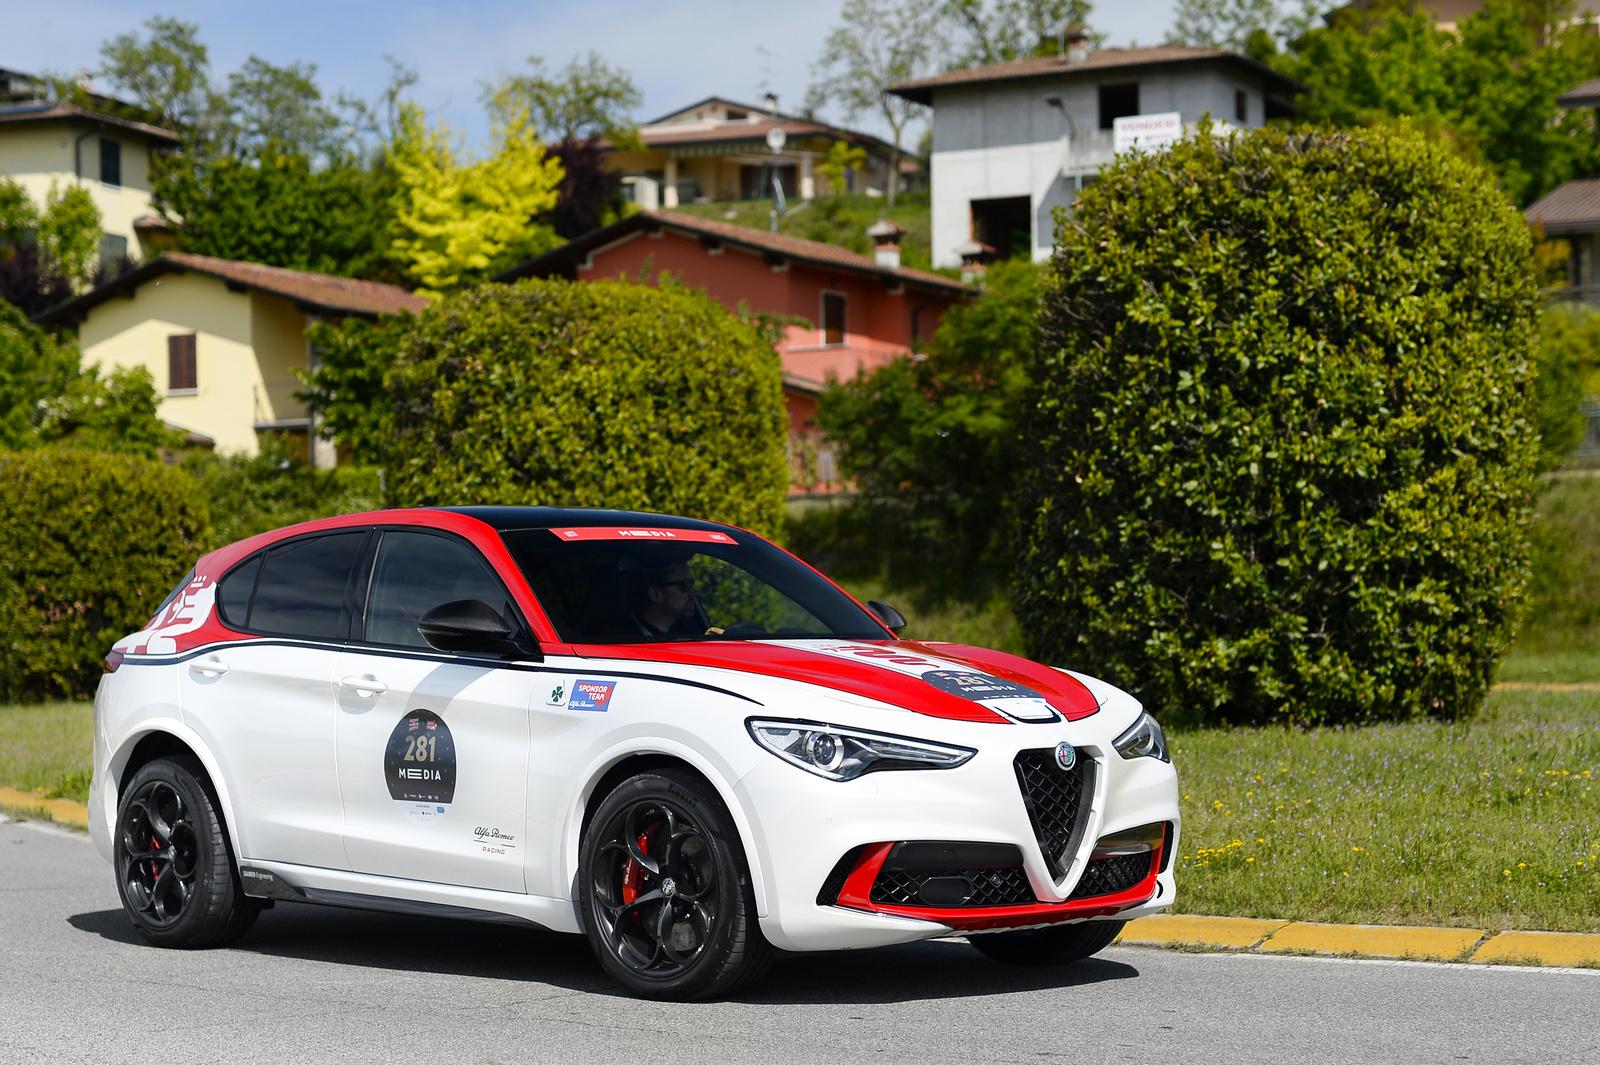 Alfa Romeo Stelvio Quadrifoglio Racing Limited Edition